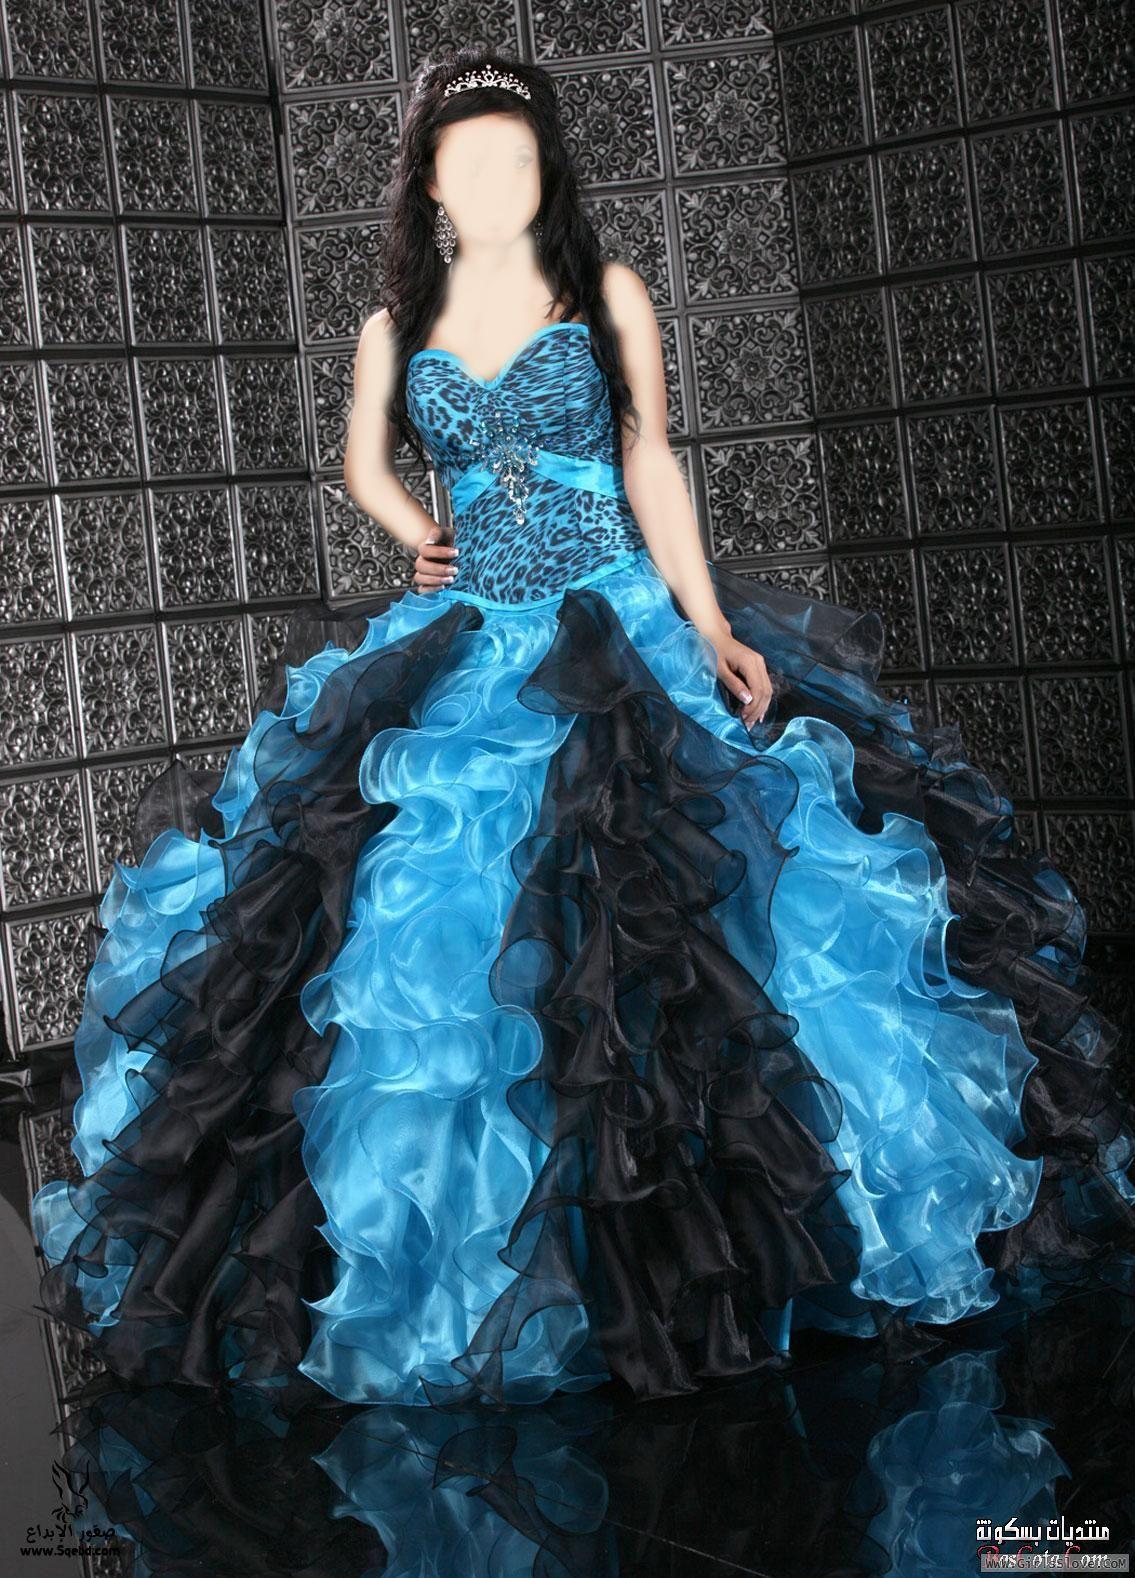 ������ ����� - ������ ����� ����- ������ Dresses EngagementDresses EngagementDresses Engagement 2013_1372559714_798.